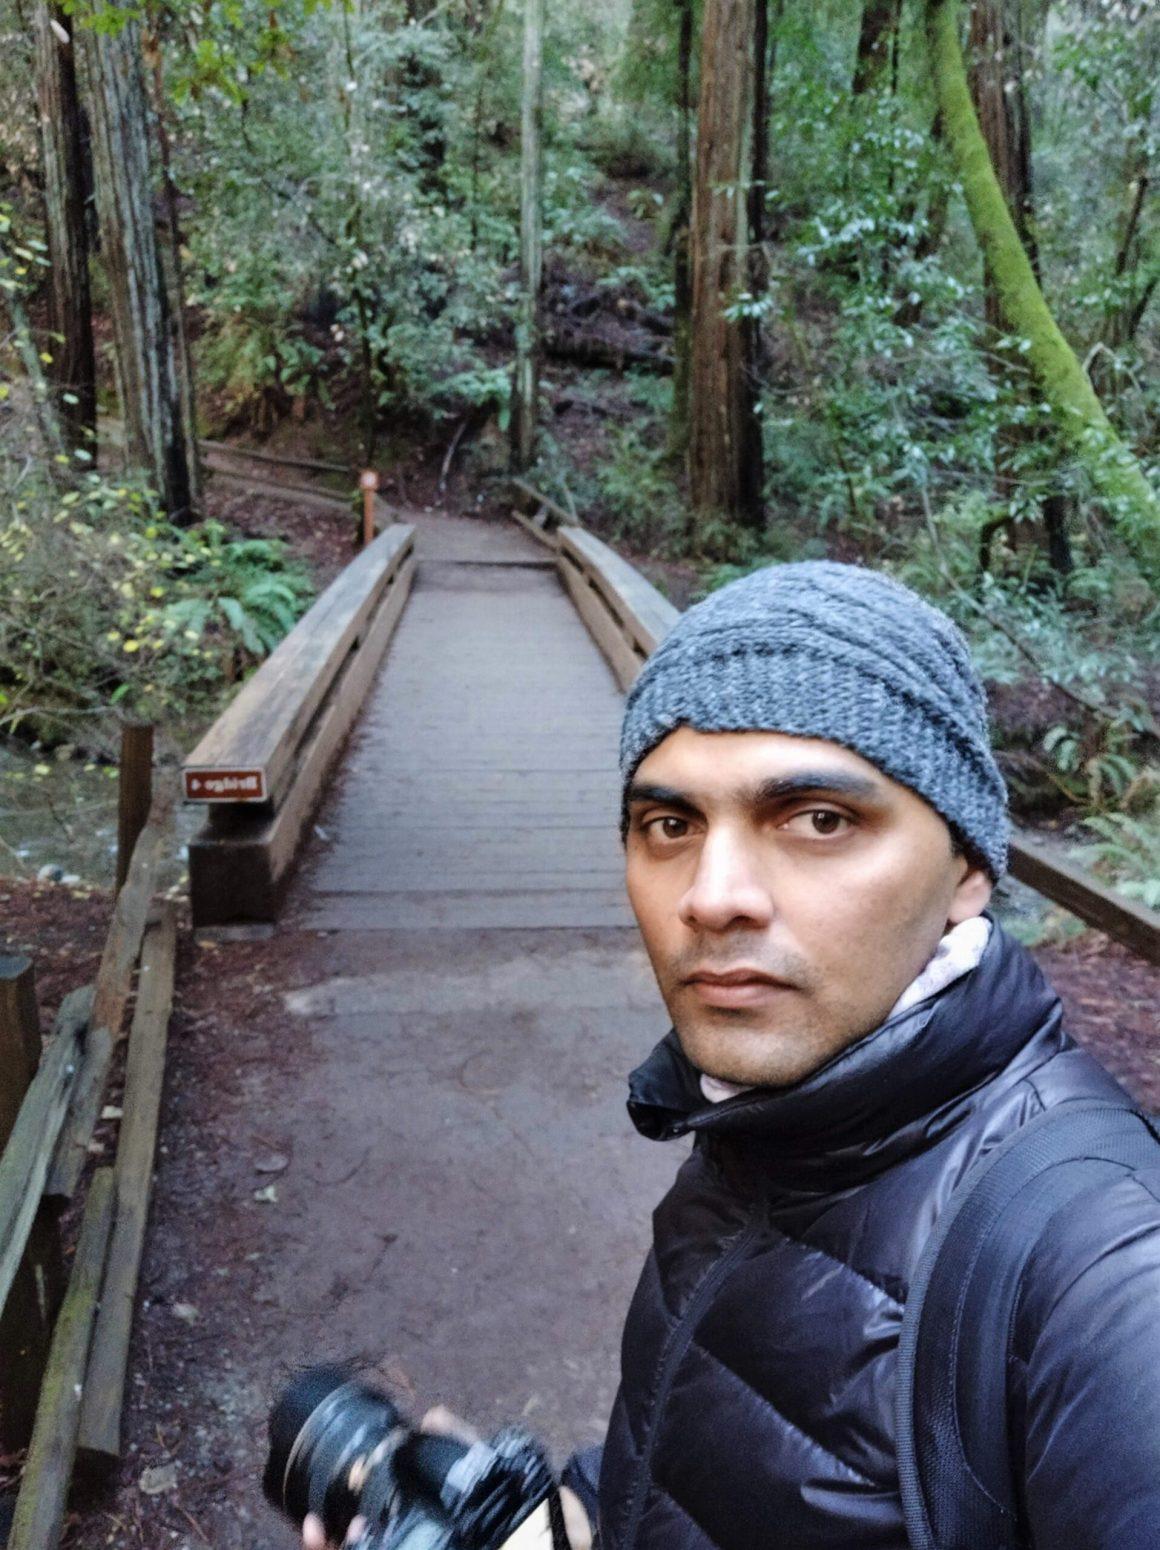 Ravindra Joisa at Muir Woods